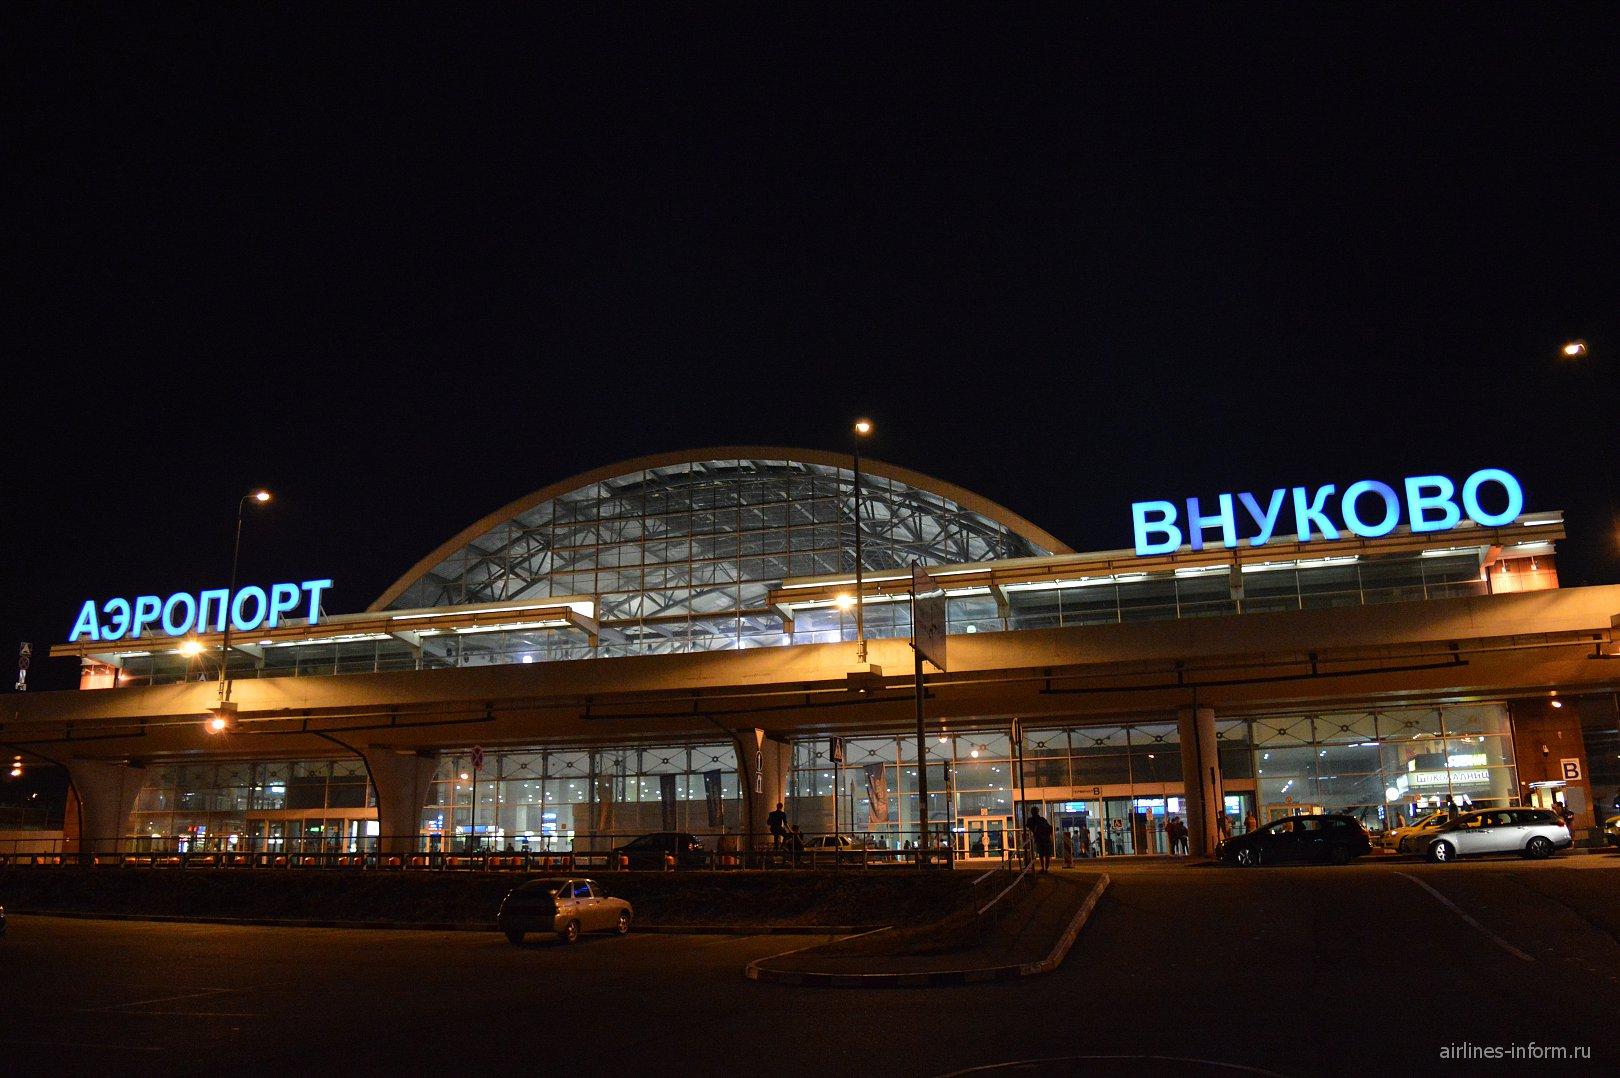 Терминал B аэропорта Внуково ночью